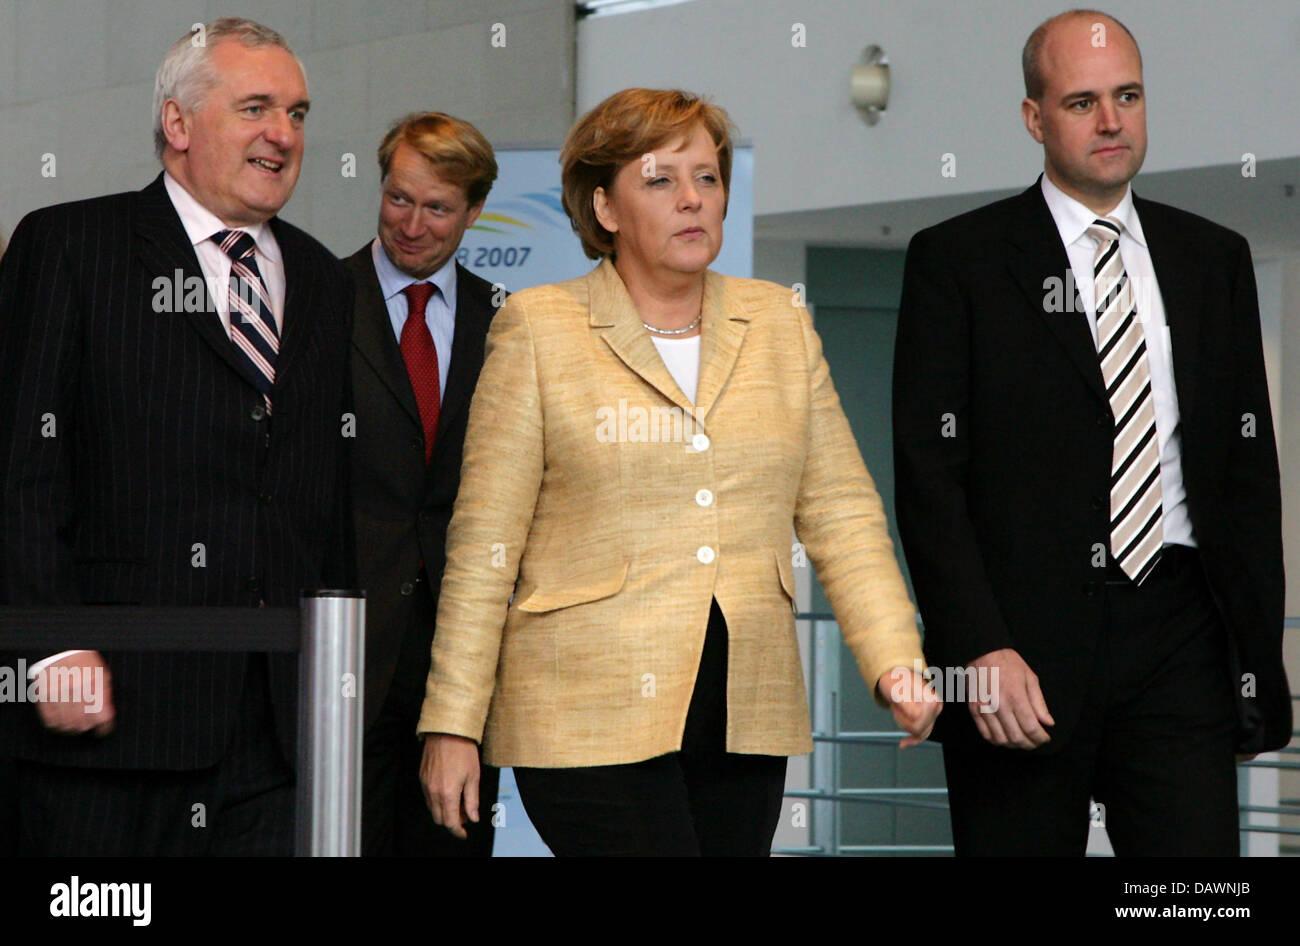 Irish Prime Minister Bertie Ahern (L), German Chancellor Angela Merkel, Swedish Prime Minister Fredrik Reinfeldt - Stock Image